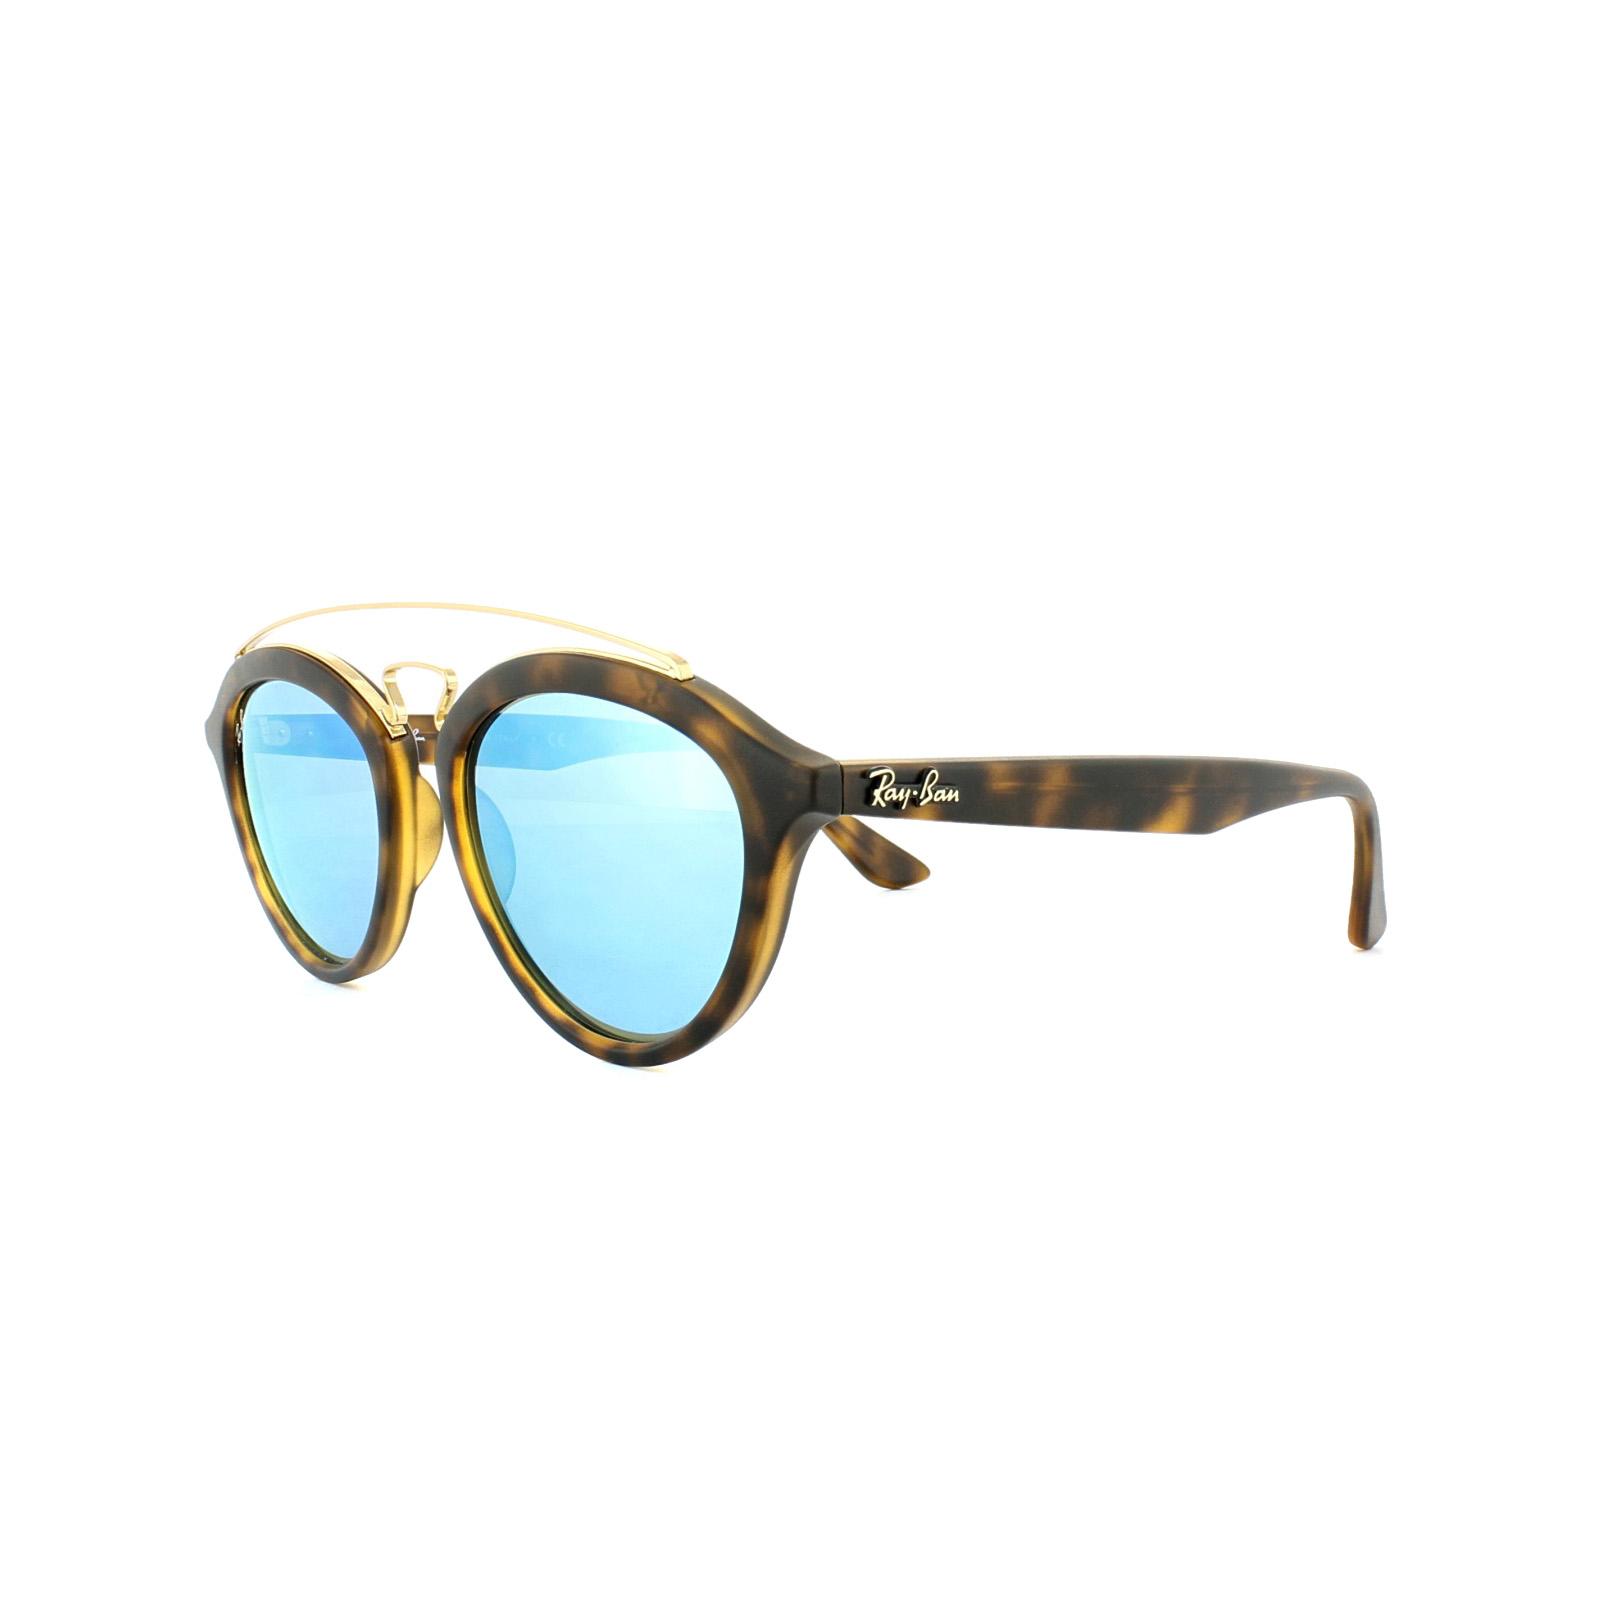 52a4e86087 Sentinel Ray-Ban Sunglasses New Gatsby 4257 609255 Matt Havana Blue Mirror  Small 50mm